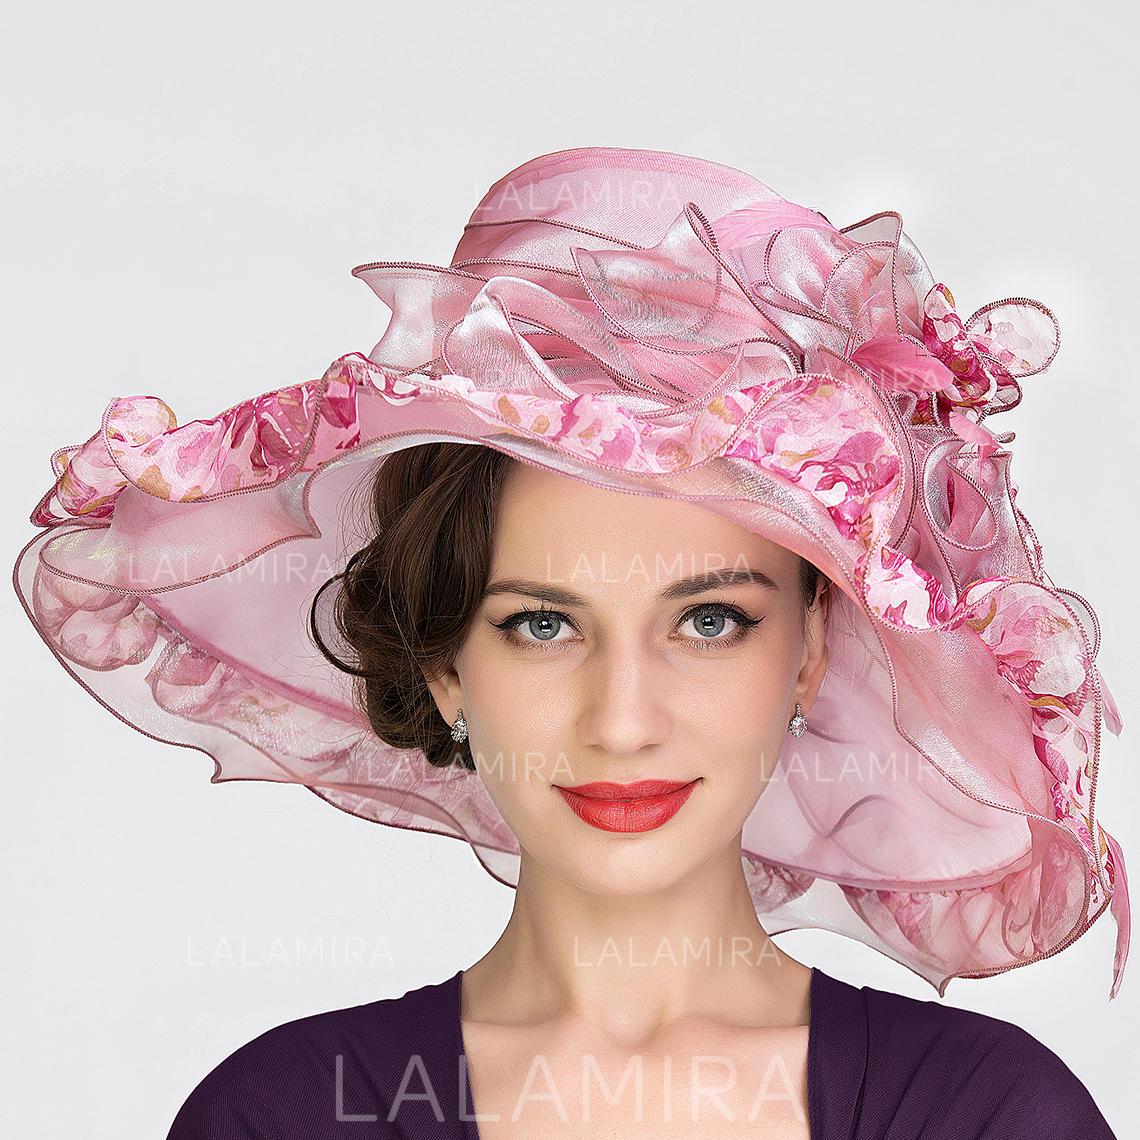 84911c00453a2 Organza Bowler Cloche Hat Beautiful Ladies  Hats (196193928). Loading zoom